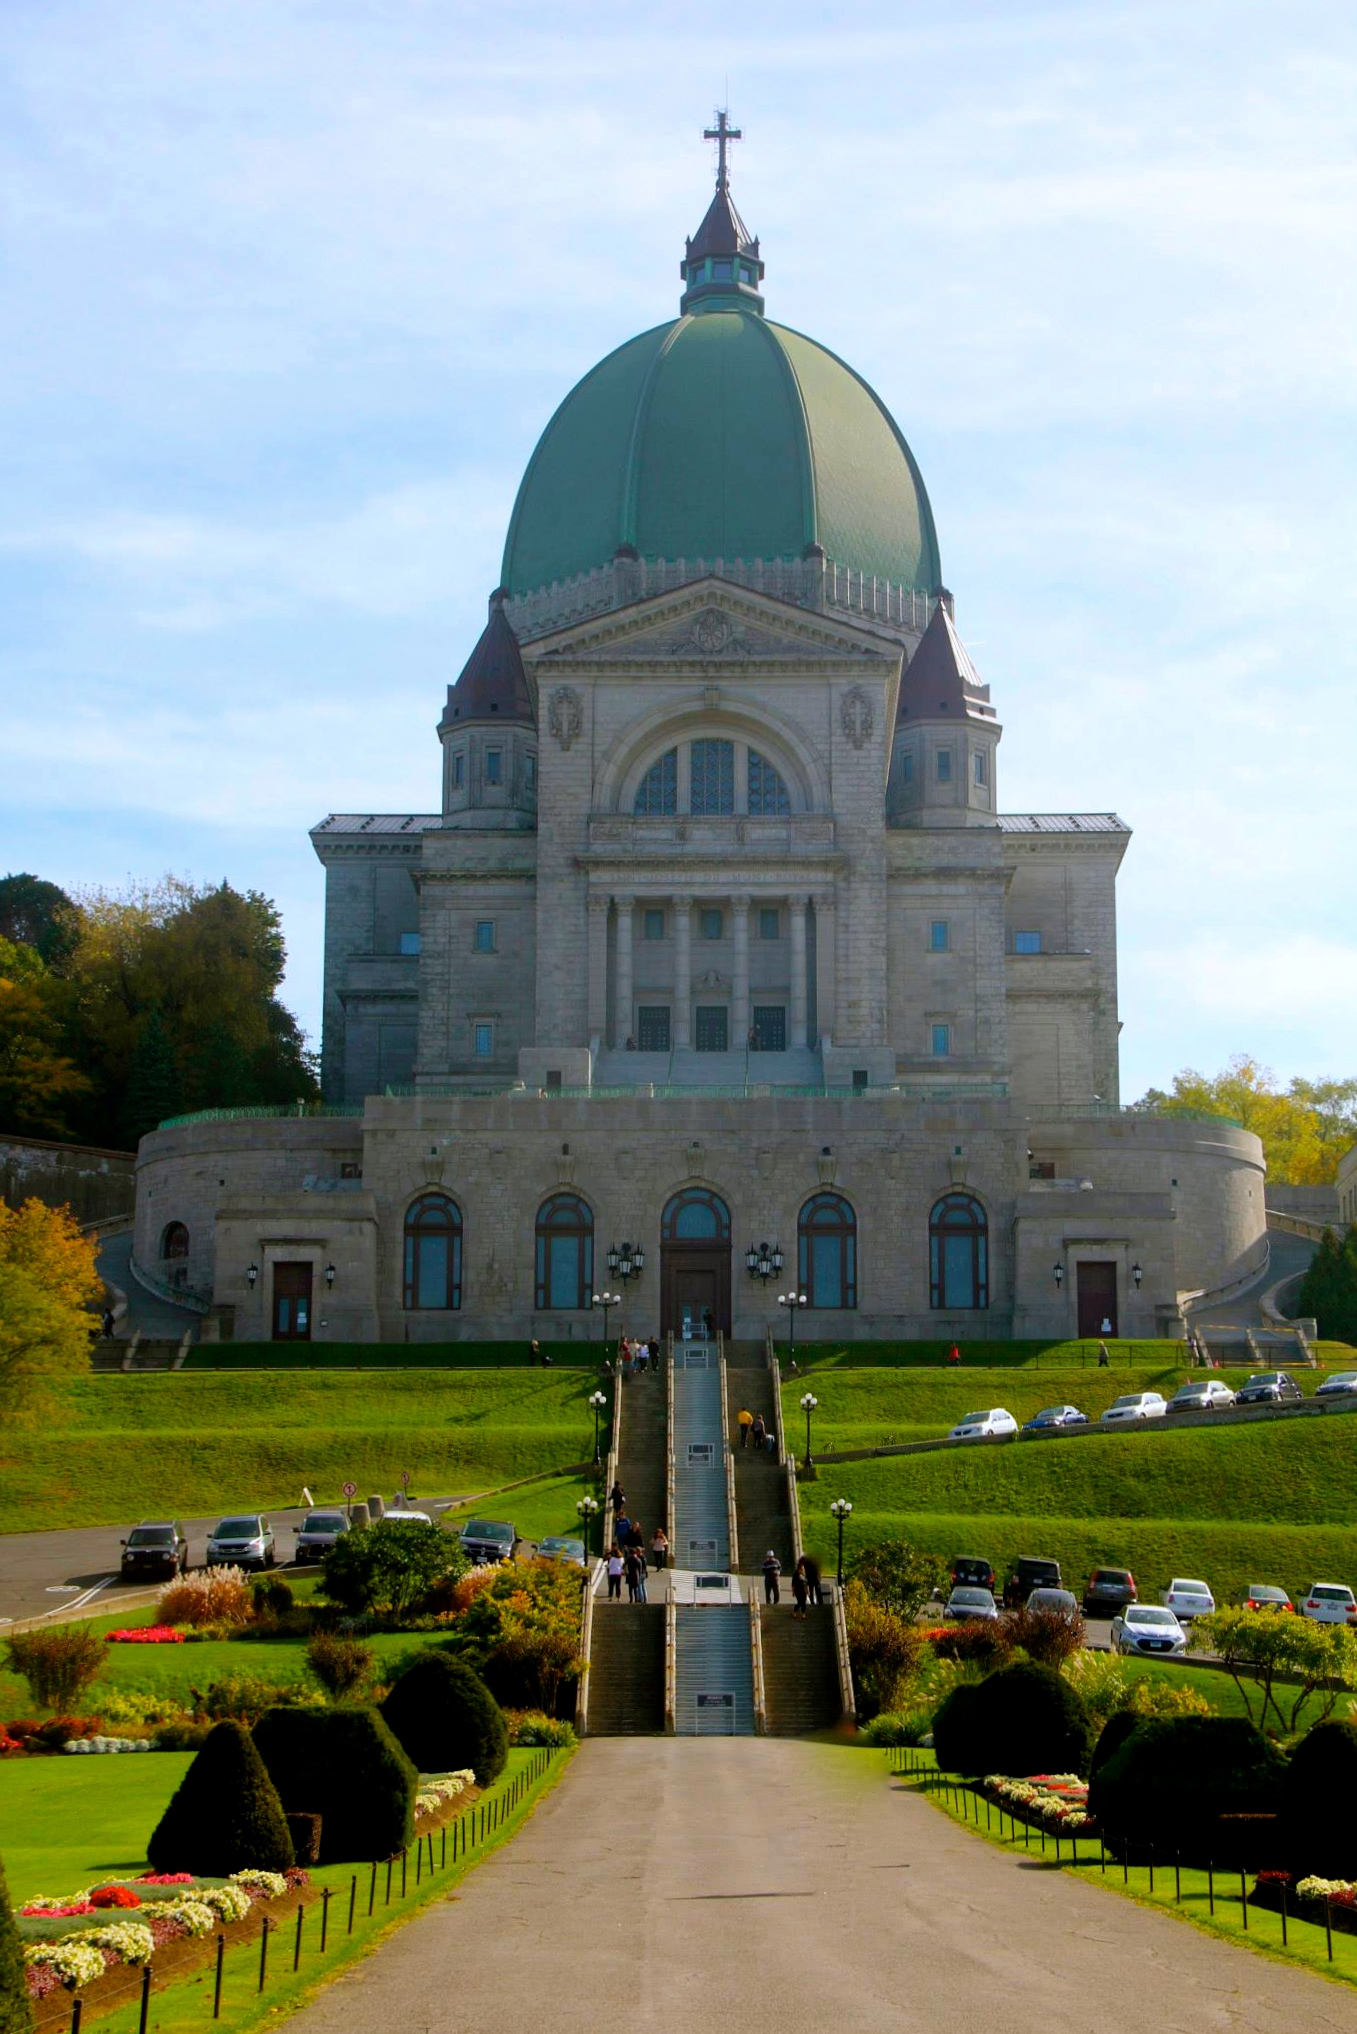 Saint Joseph's Oratory of Mount Royal, Montreal, Quebec, Canada